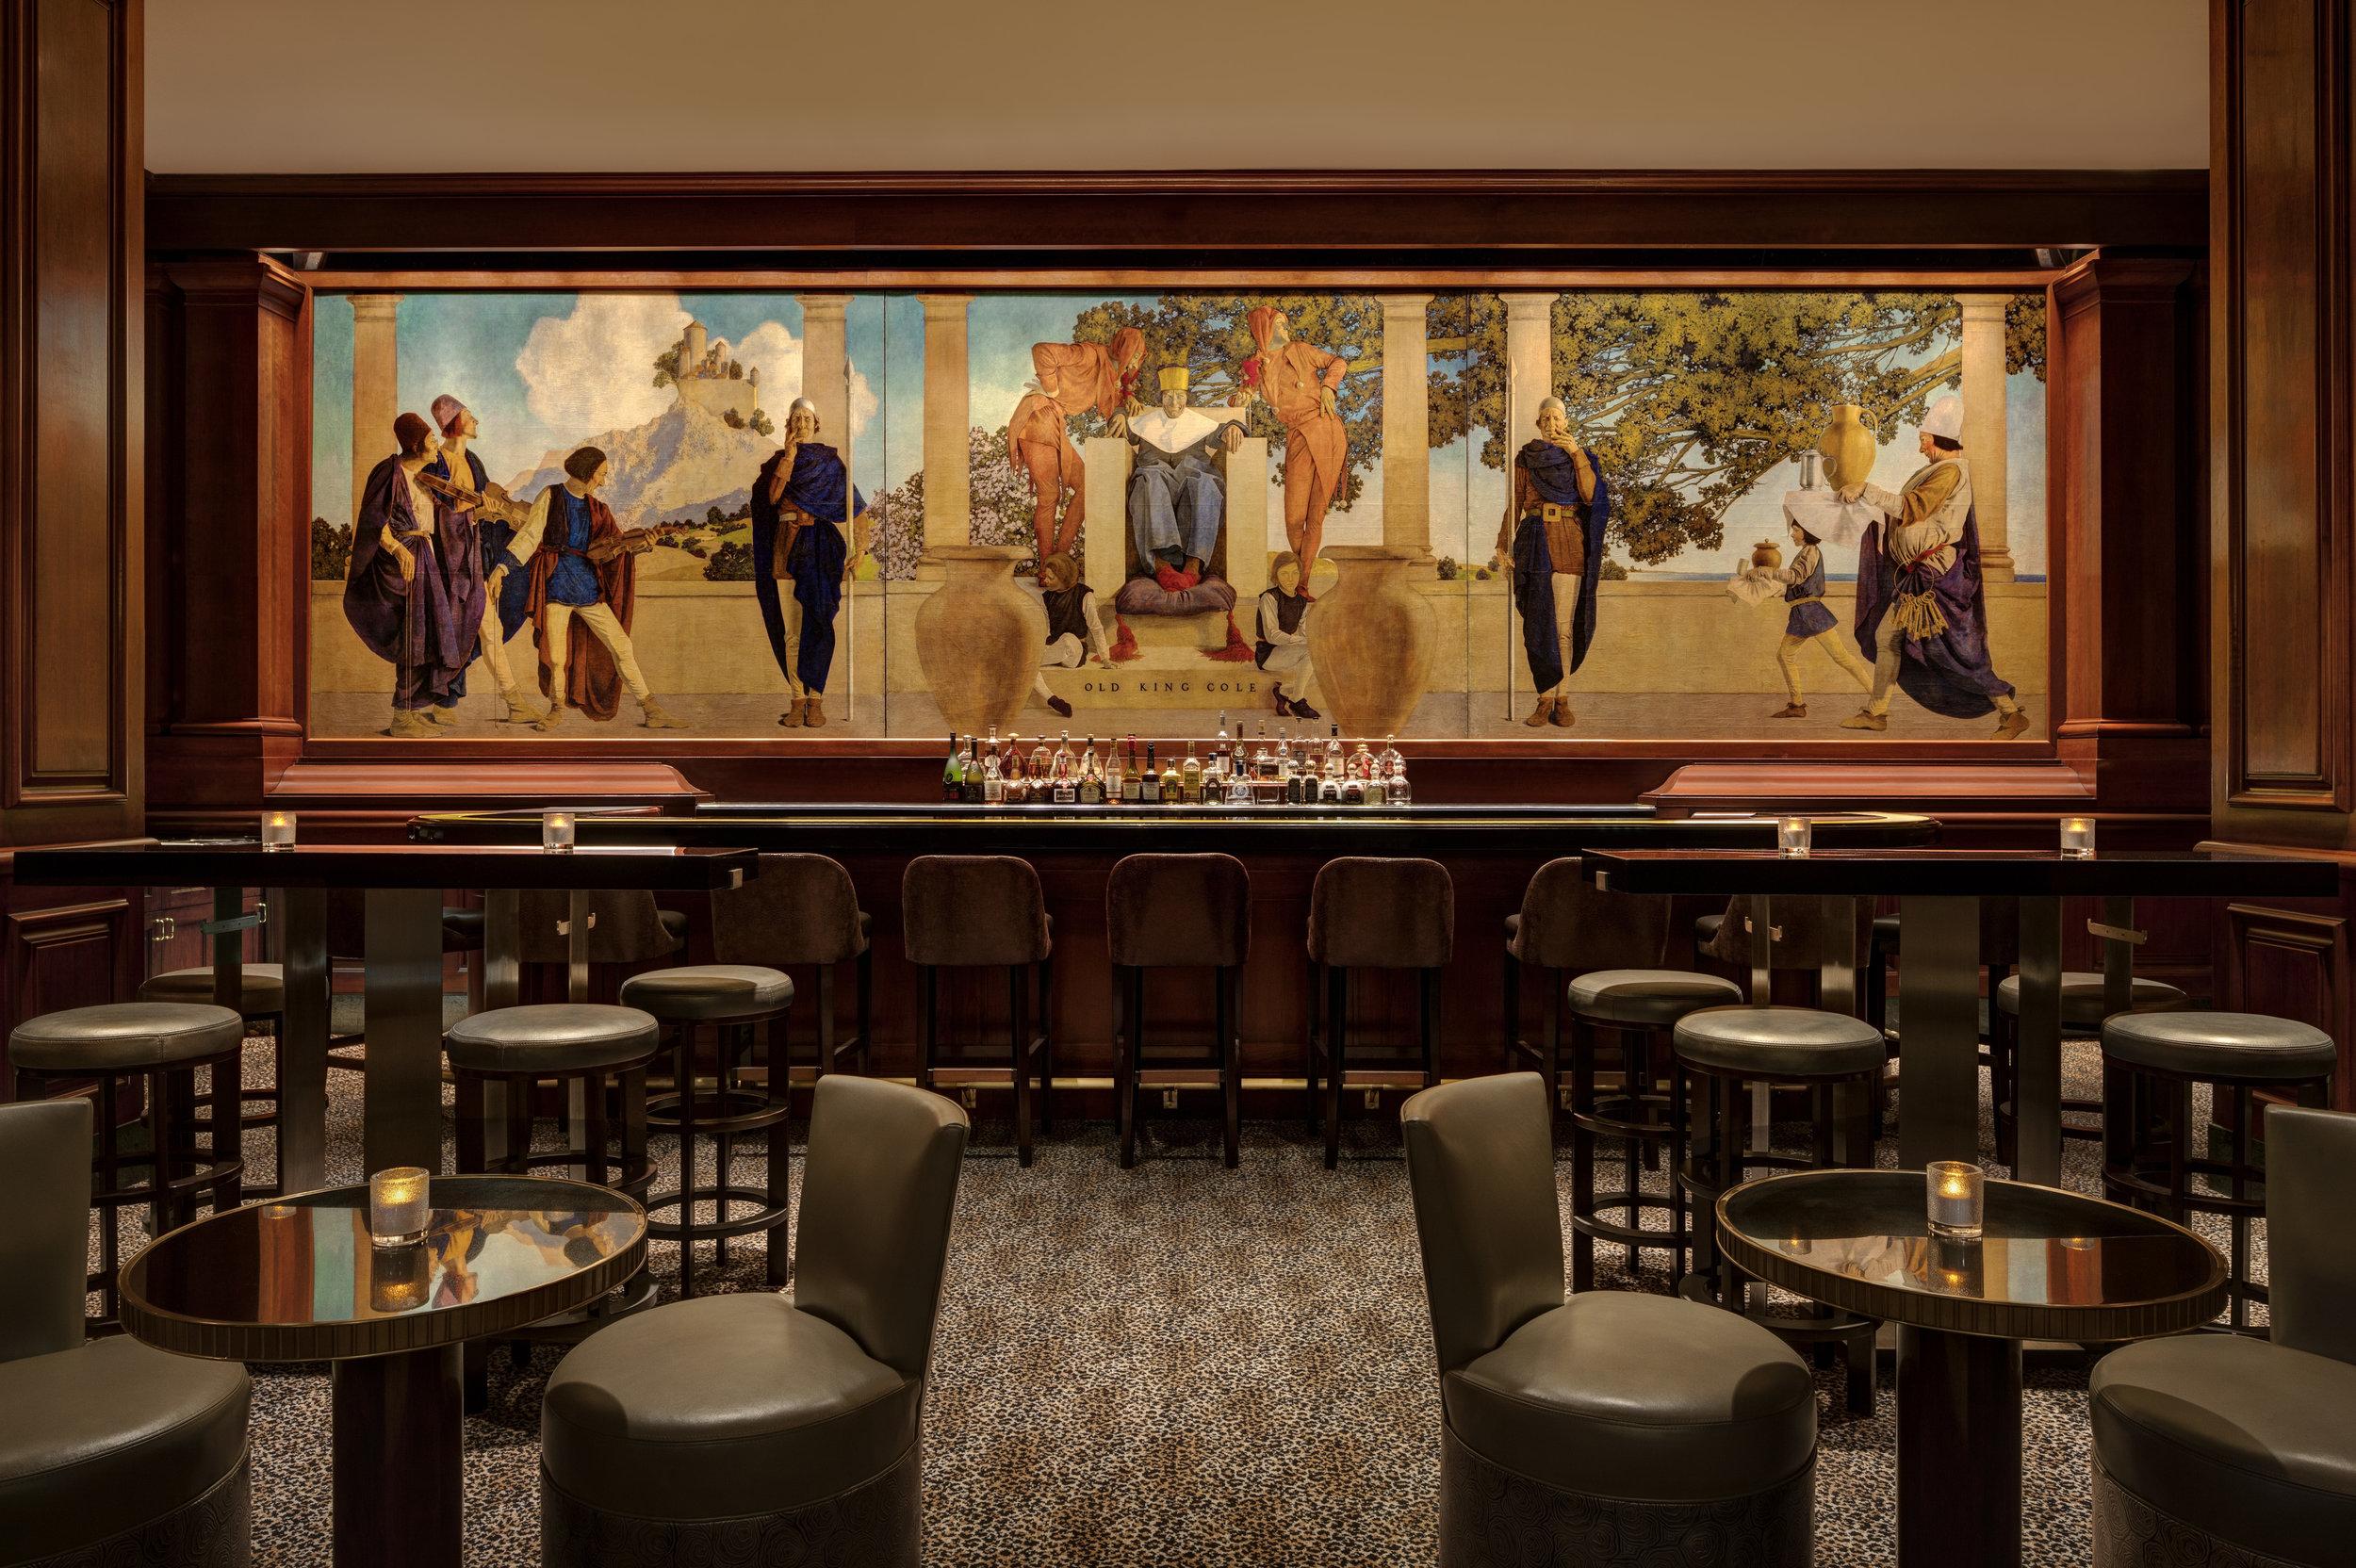 St Regis NY - King Cole Bar.jpg